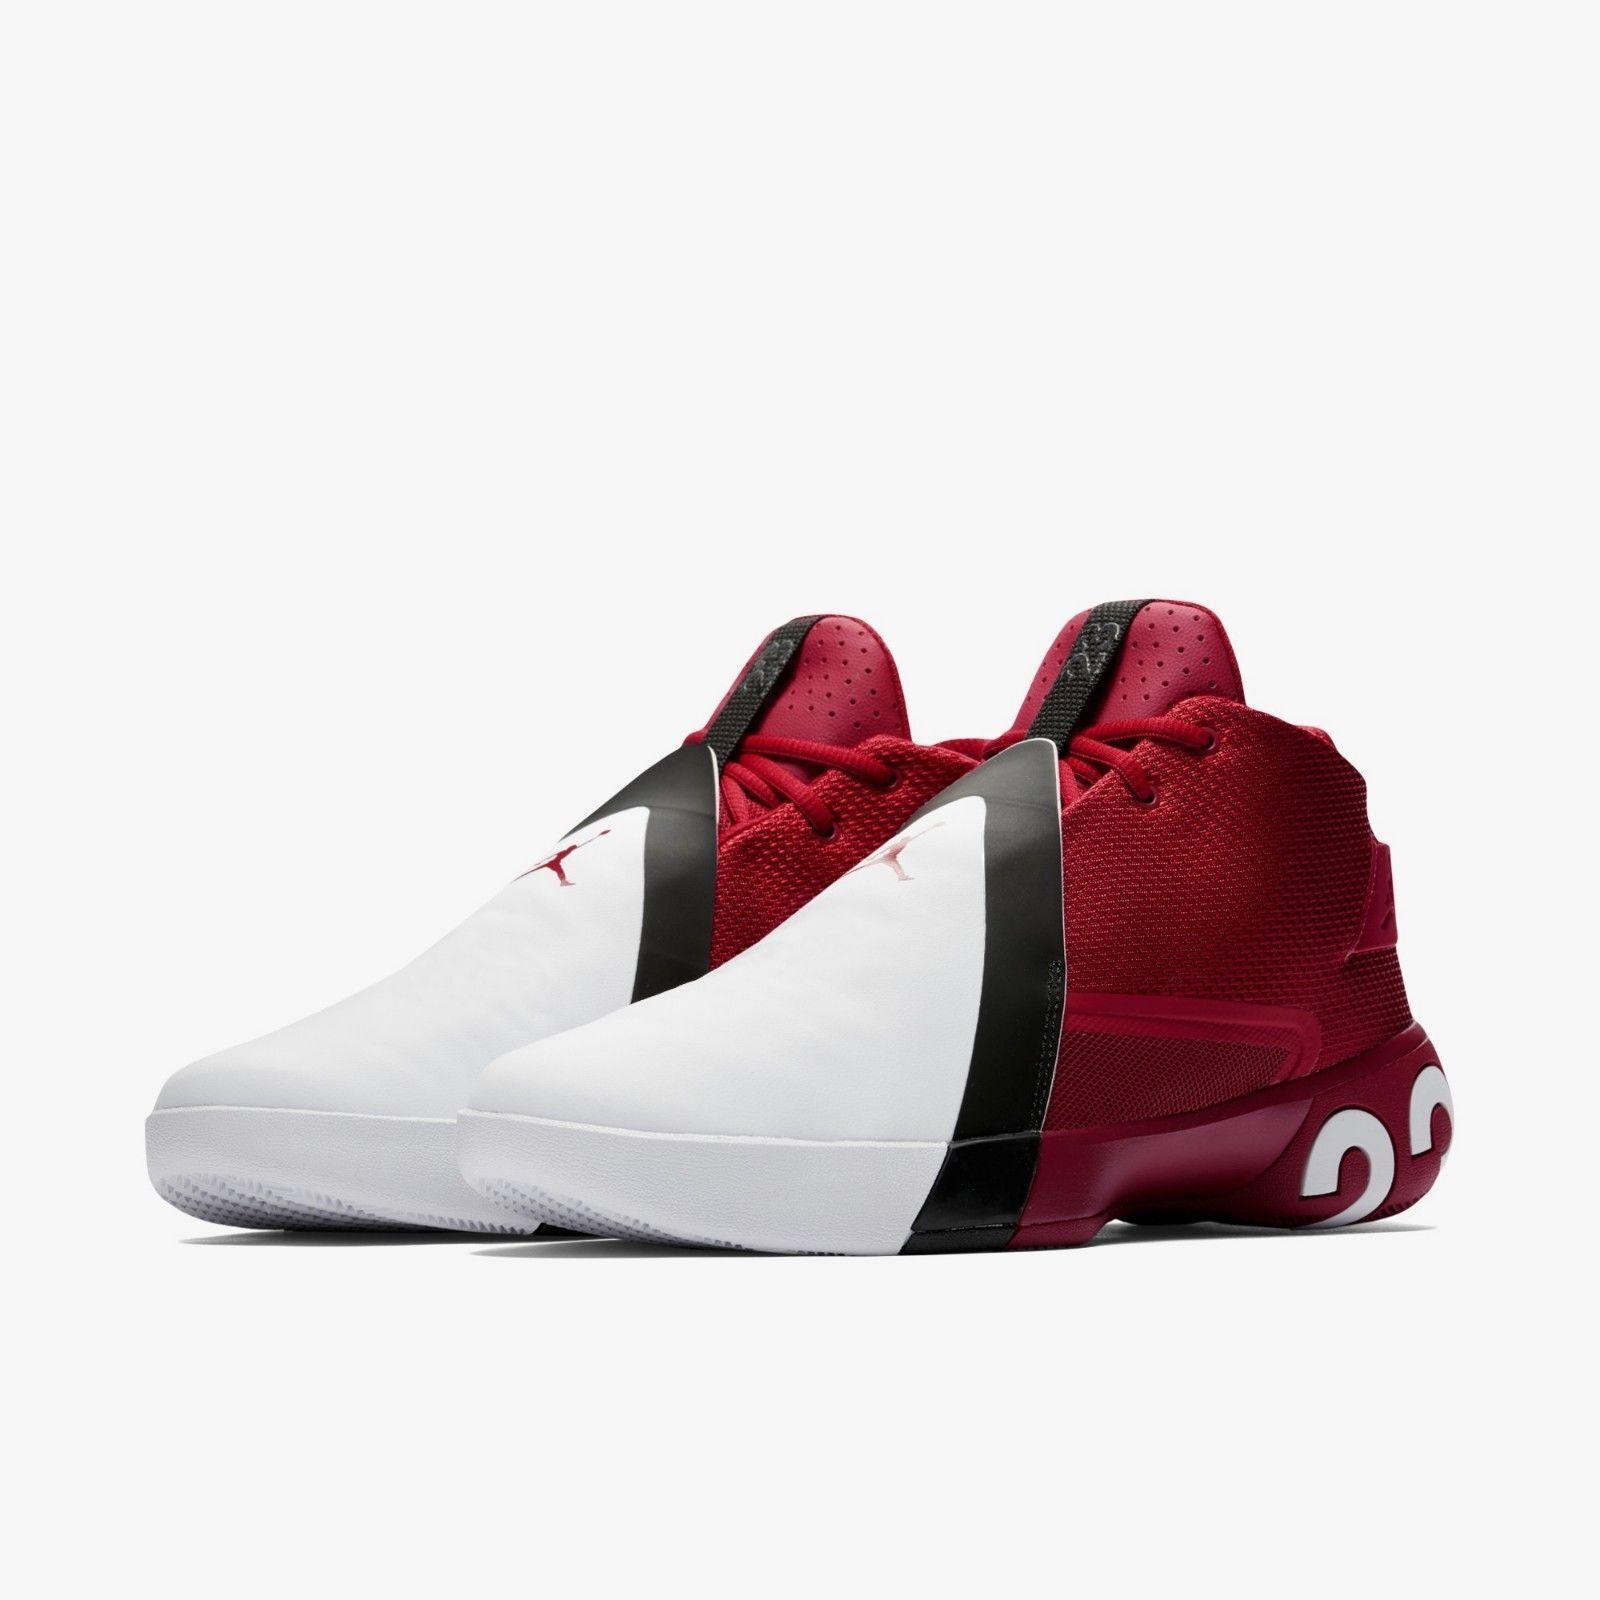 Nike Nike Nike - 3 ar0044-601 fliegen mit jordan 11 usa neue 10 - europe) 325ae9